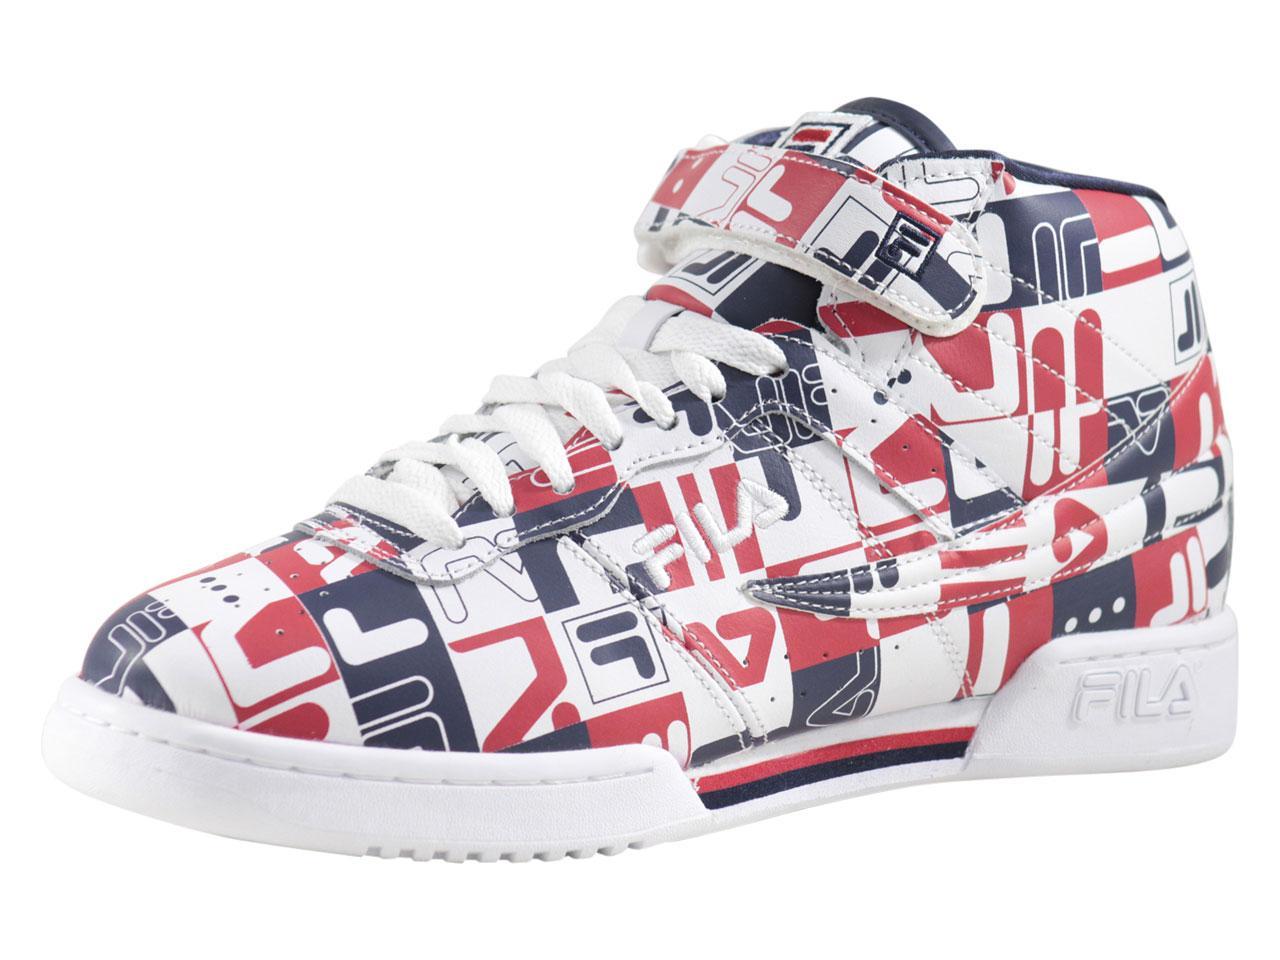 8fd671af2e Fila Men's F-13-Archive-Print Sneakers Shoes